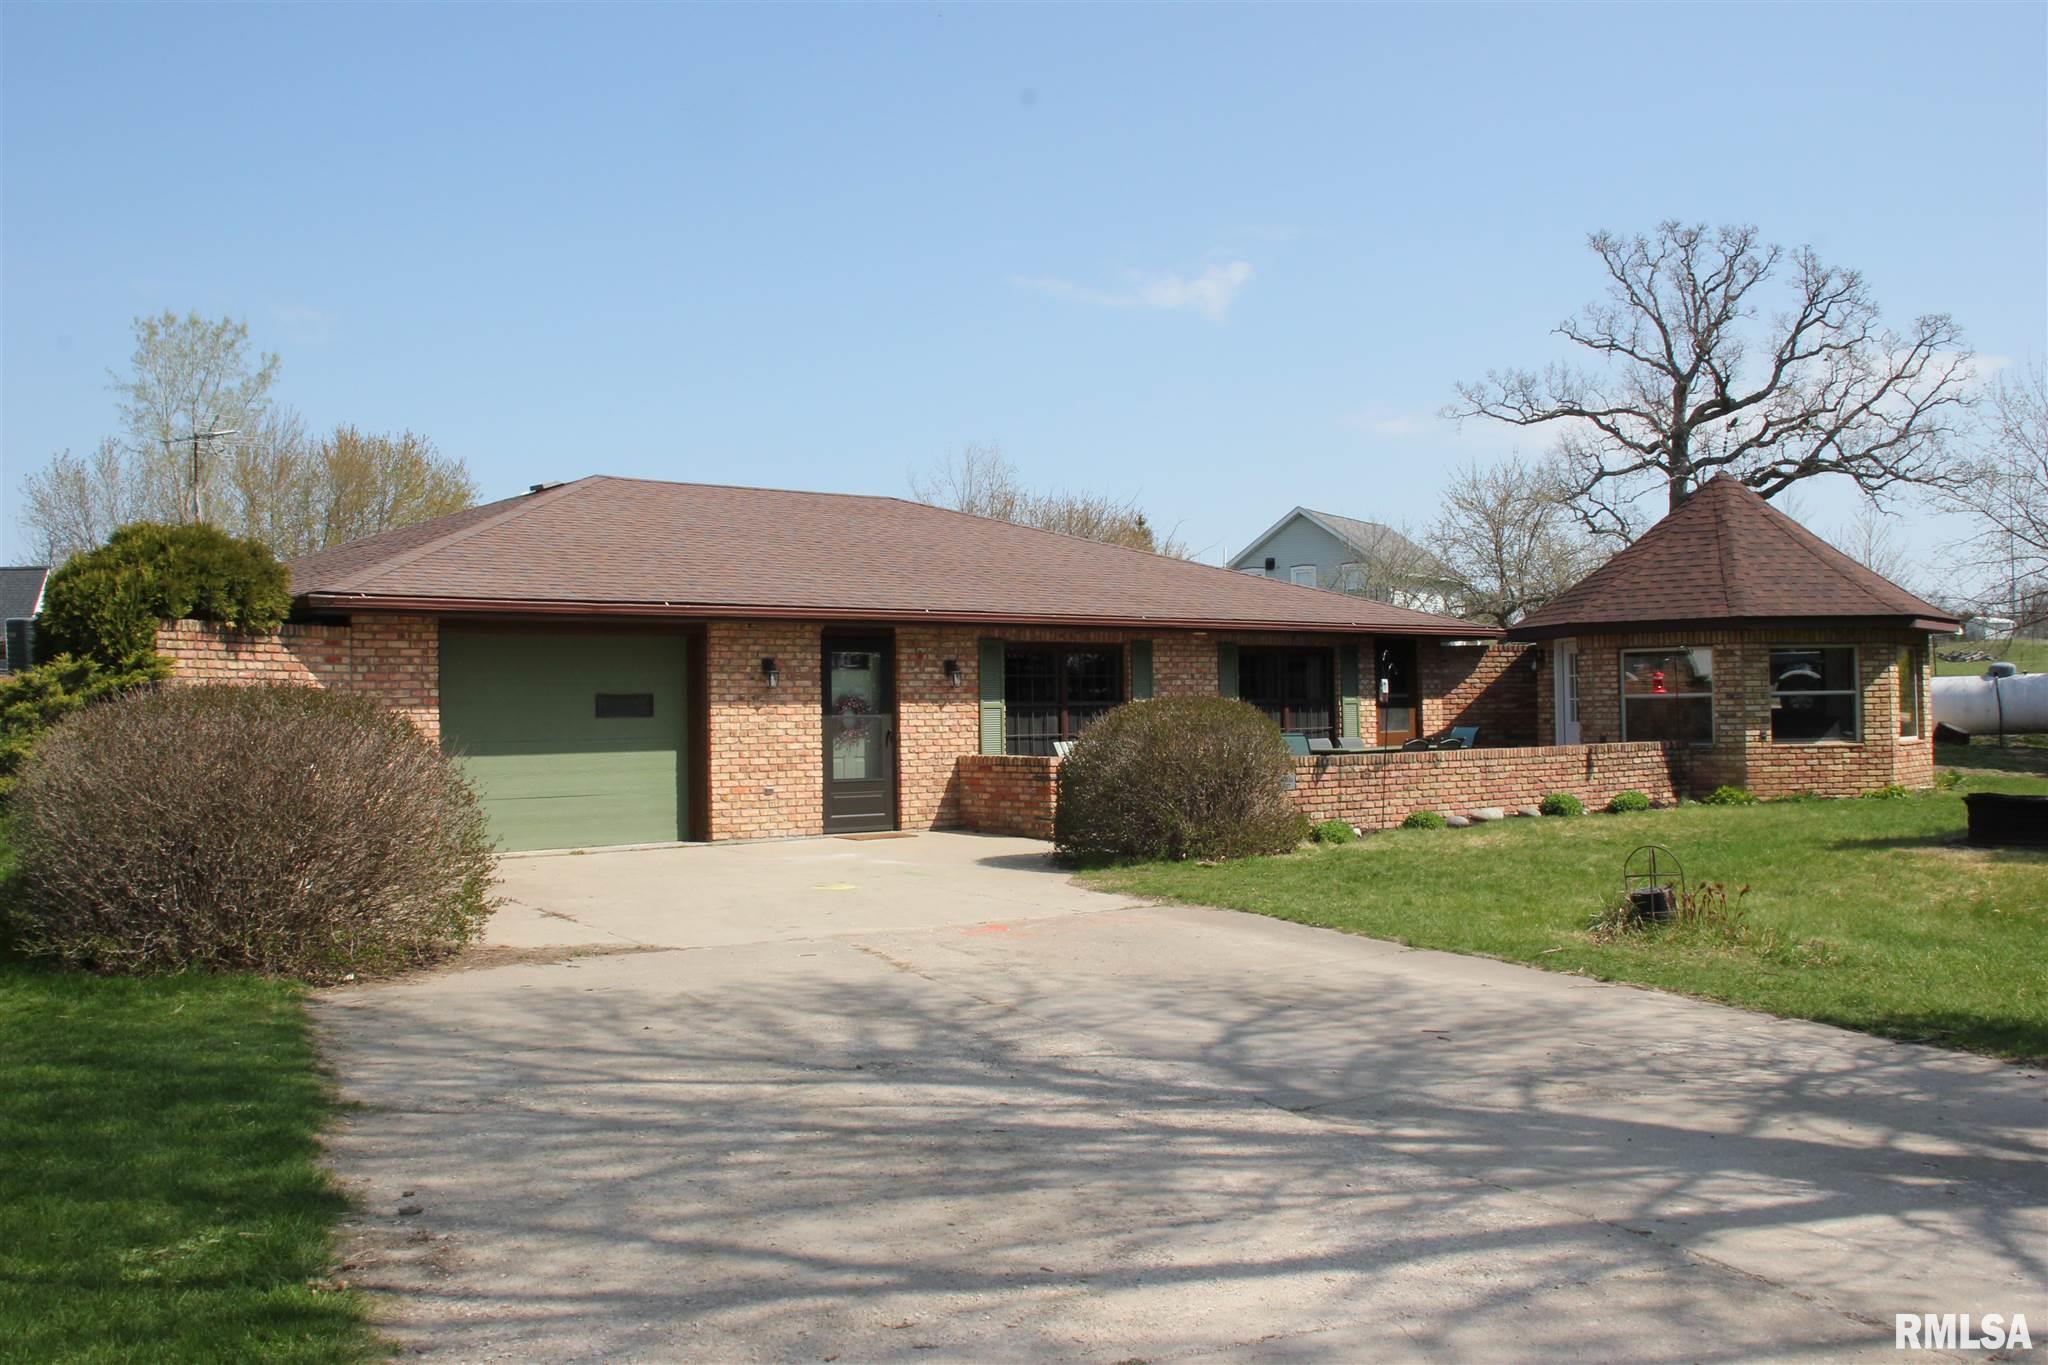 2680 252ND Property Photo - De Witt, IA real estate listing